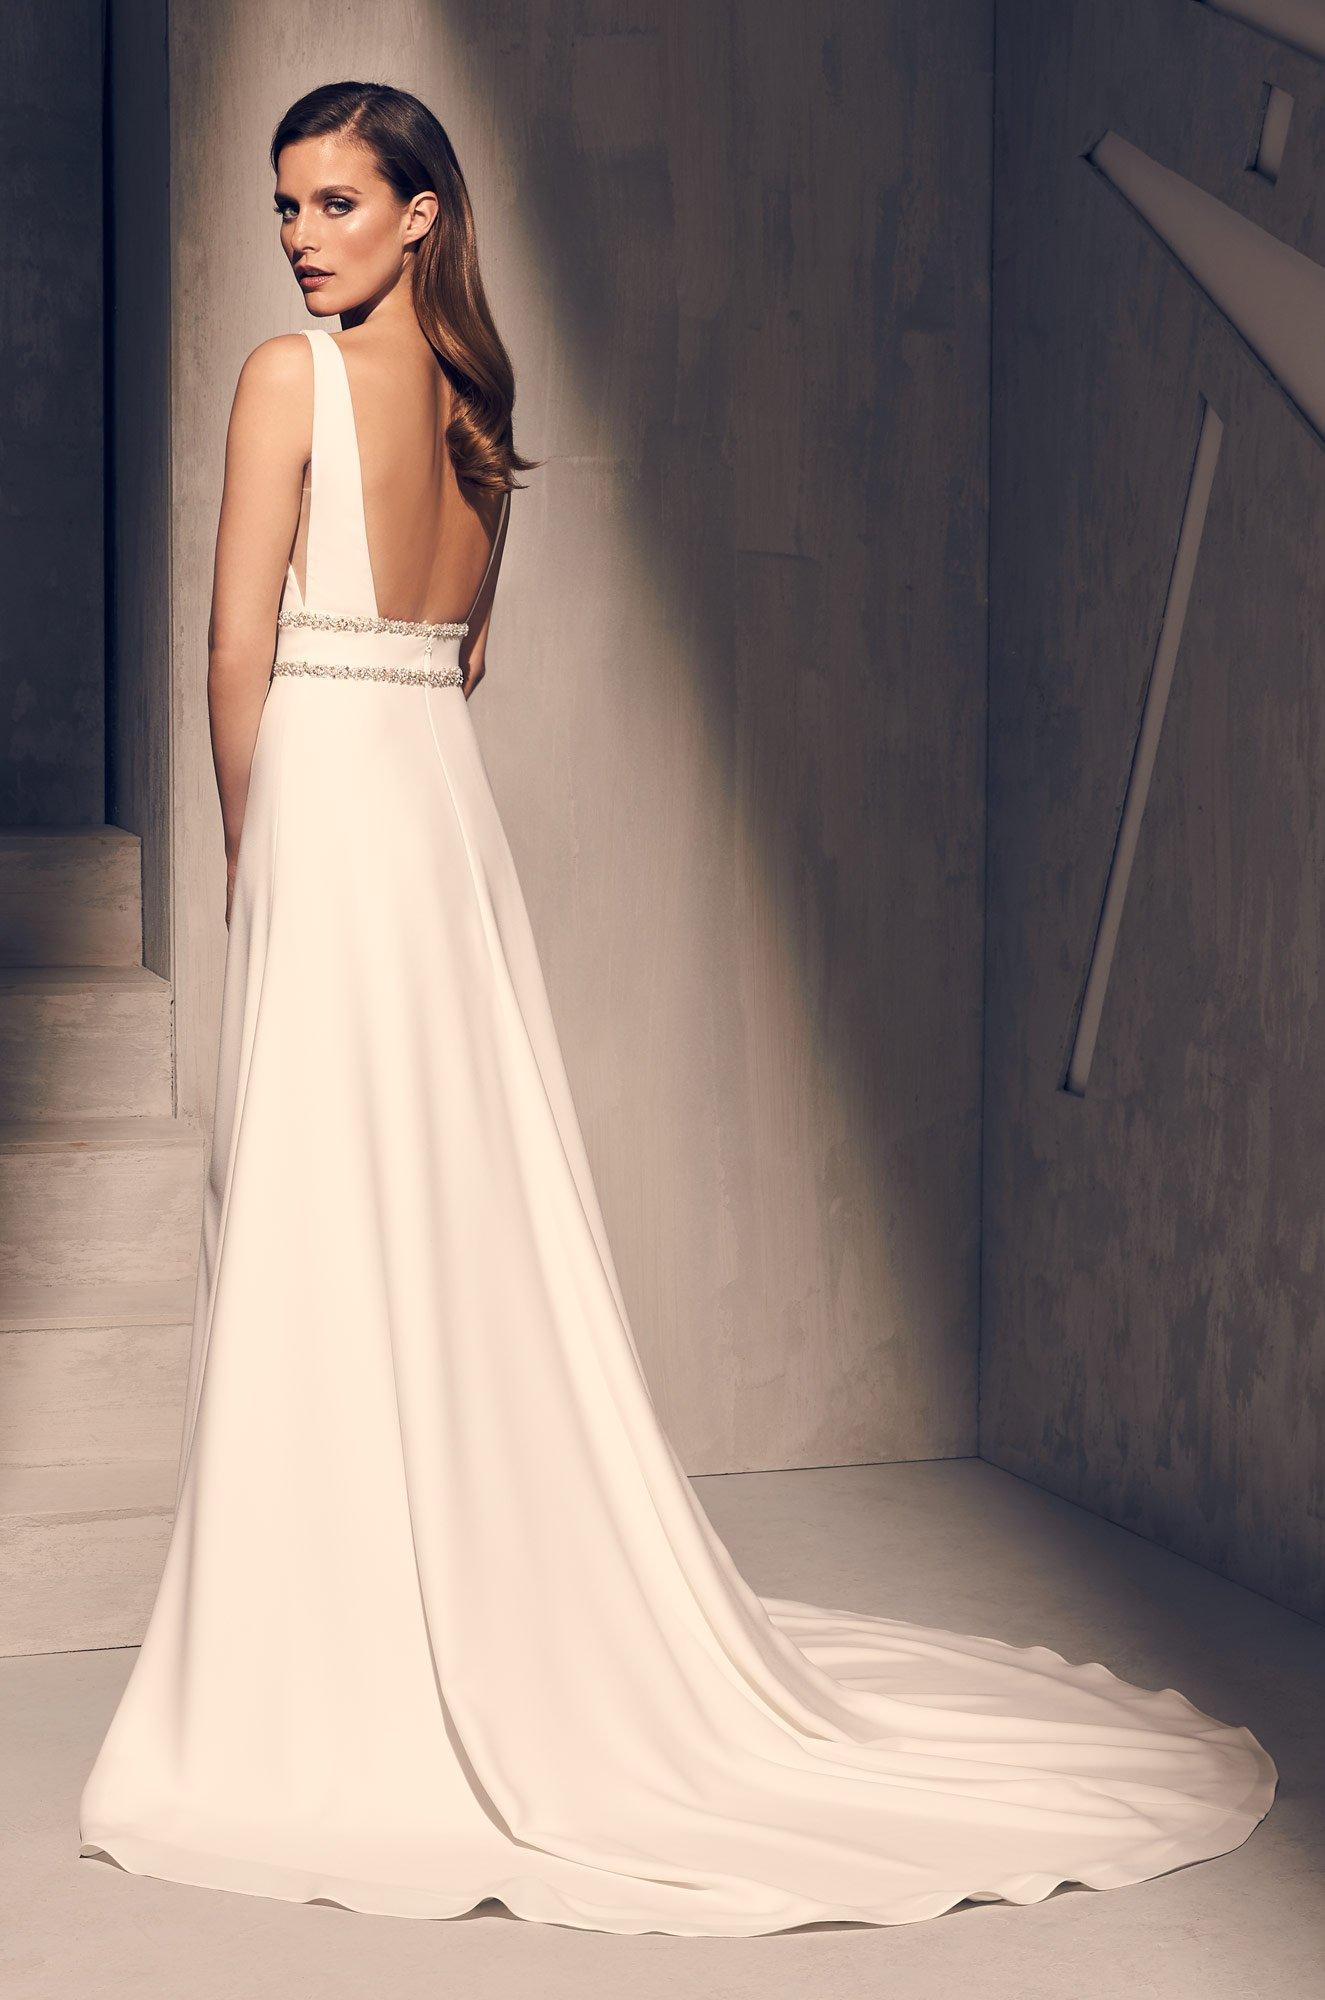 Dazzling Crêpe Wedding Dress - Style #2214 | Mikaella Bridal